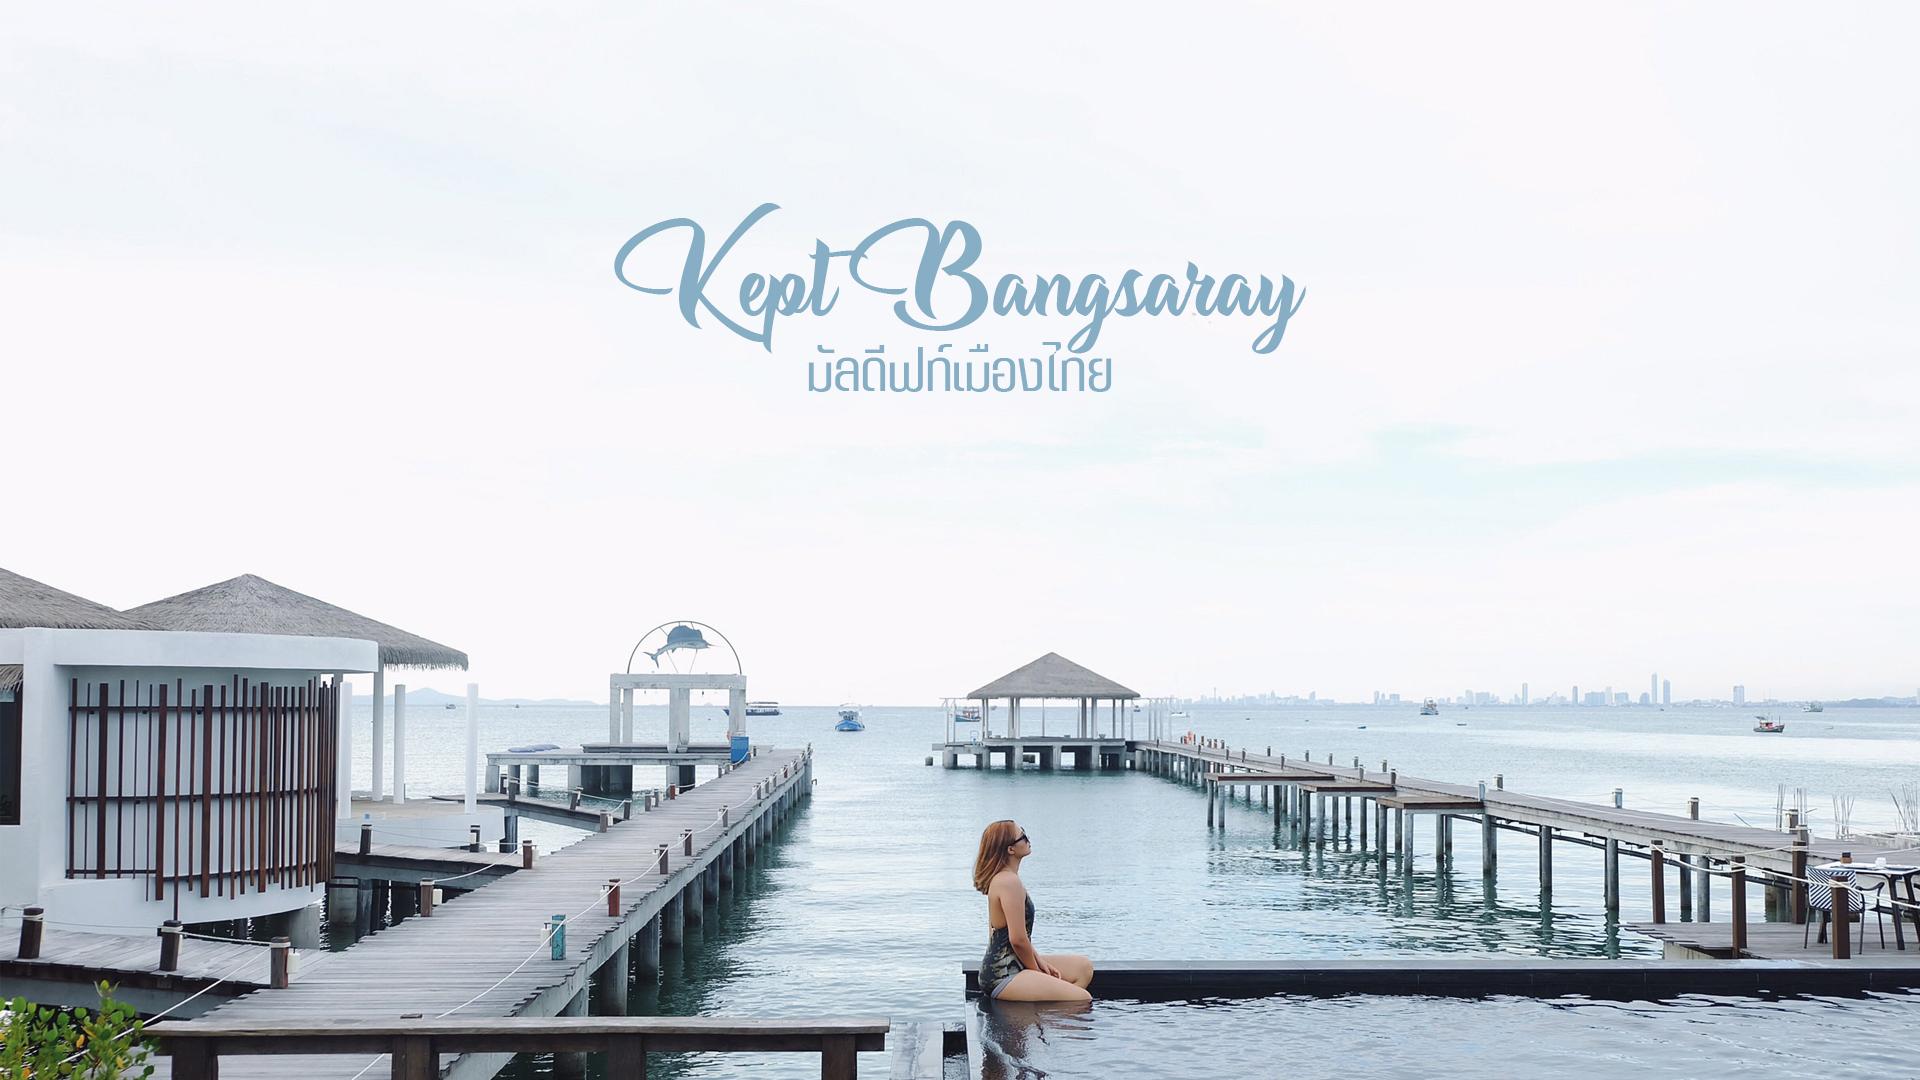 Kept Bangsaray มัลดีฟท์เมืองไทย